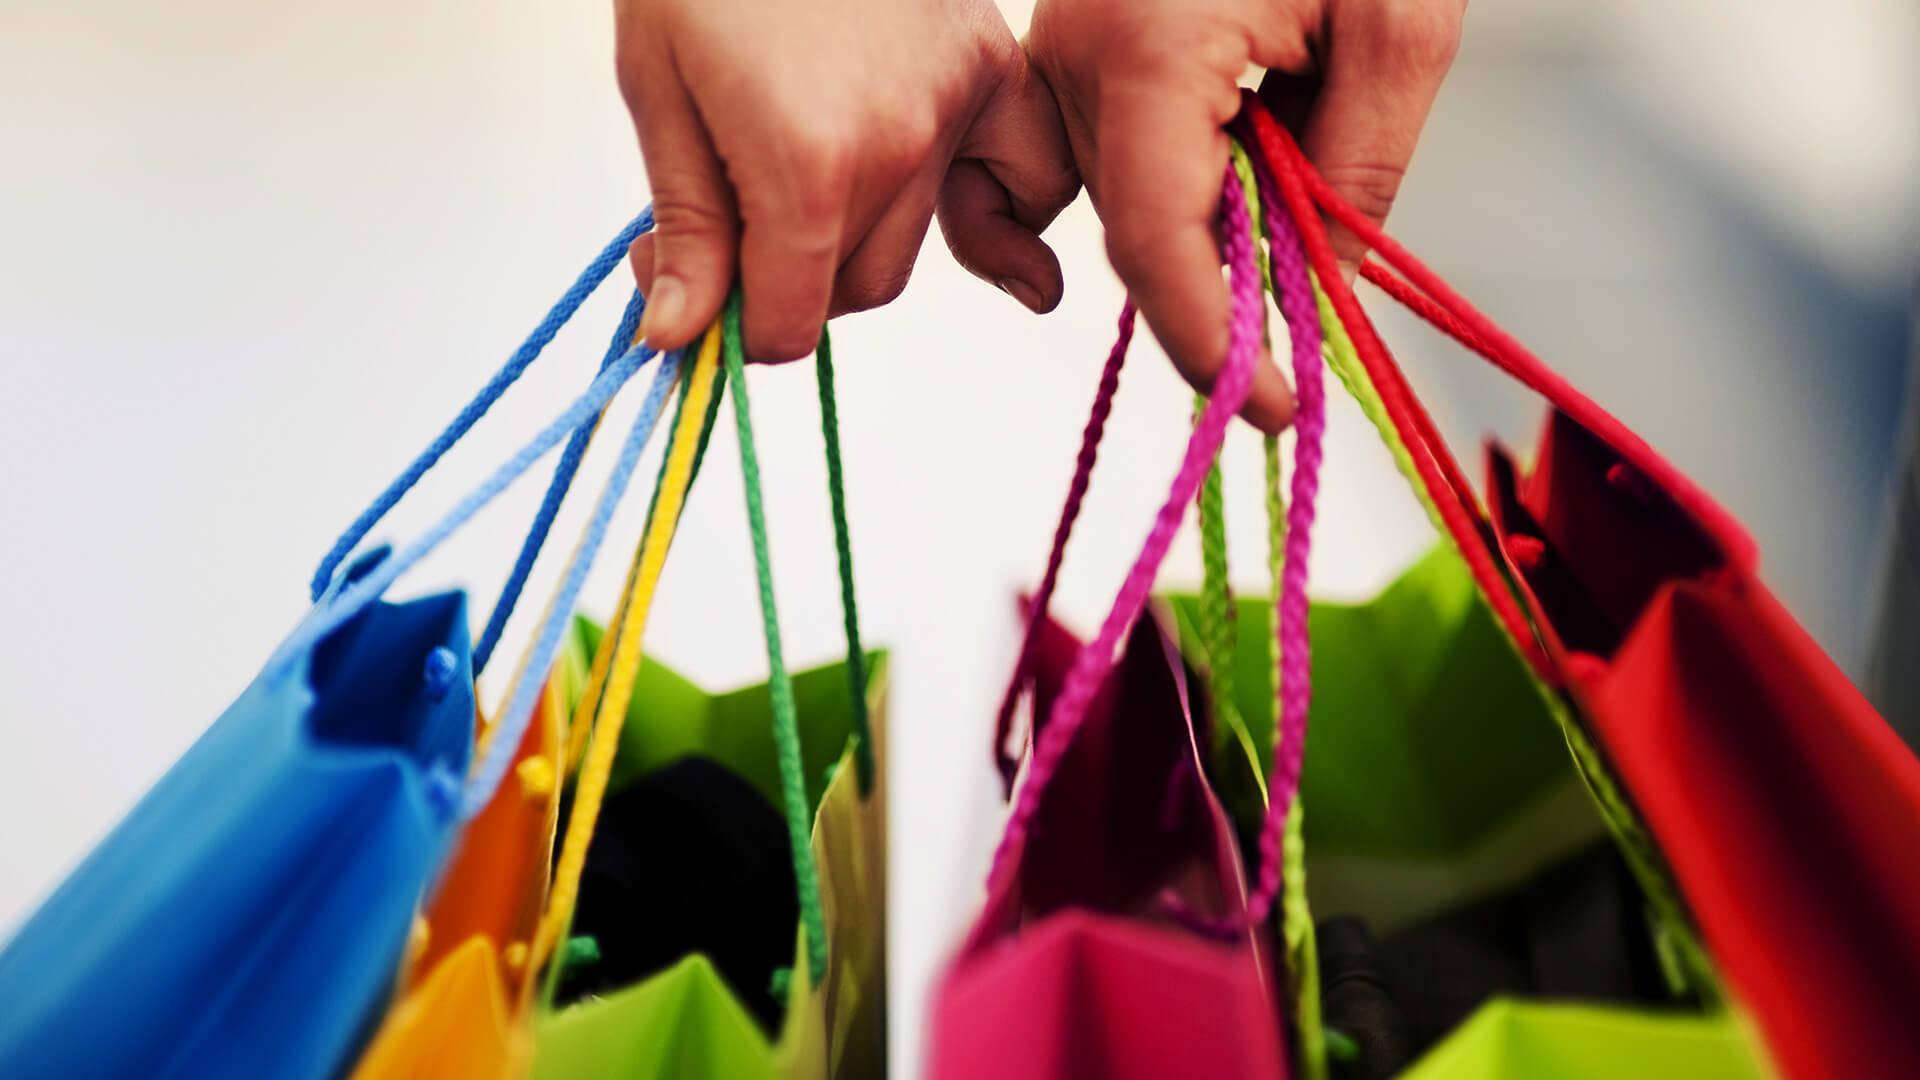 501b555f628b7c7a2d1b_shopping.jpg